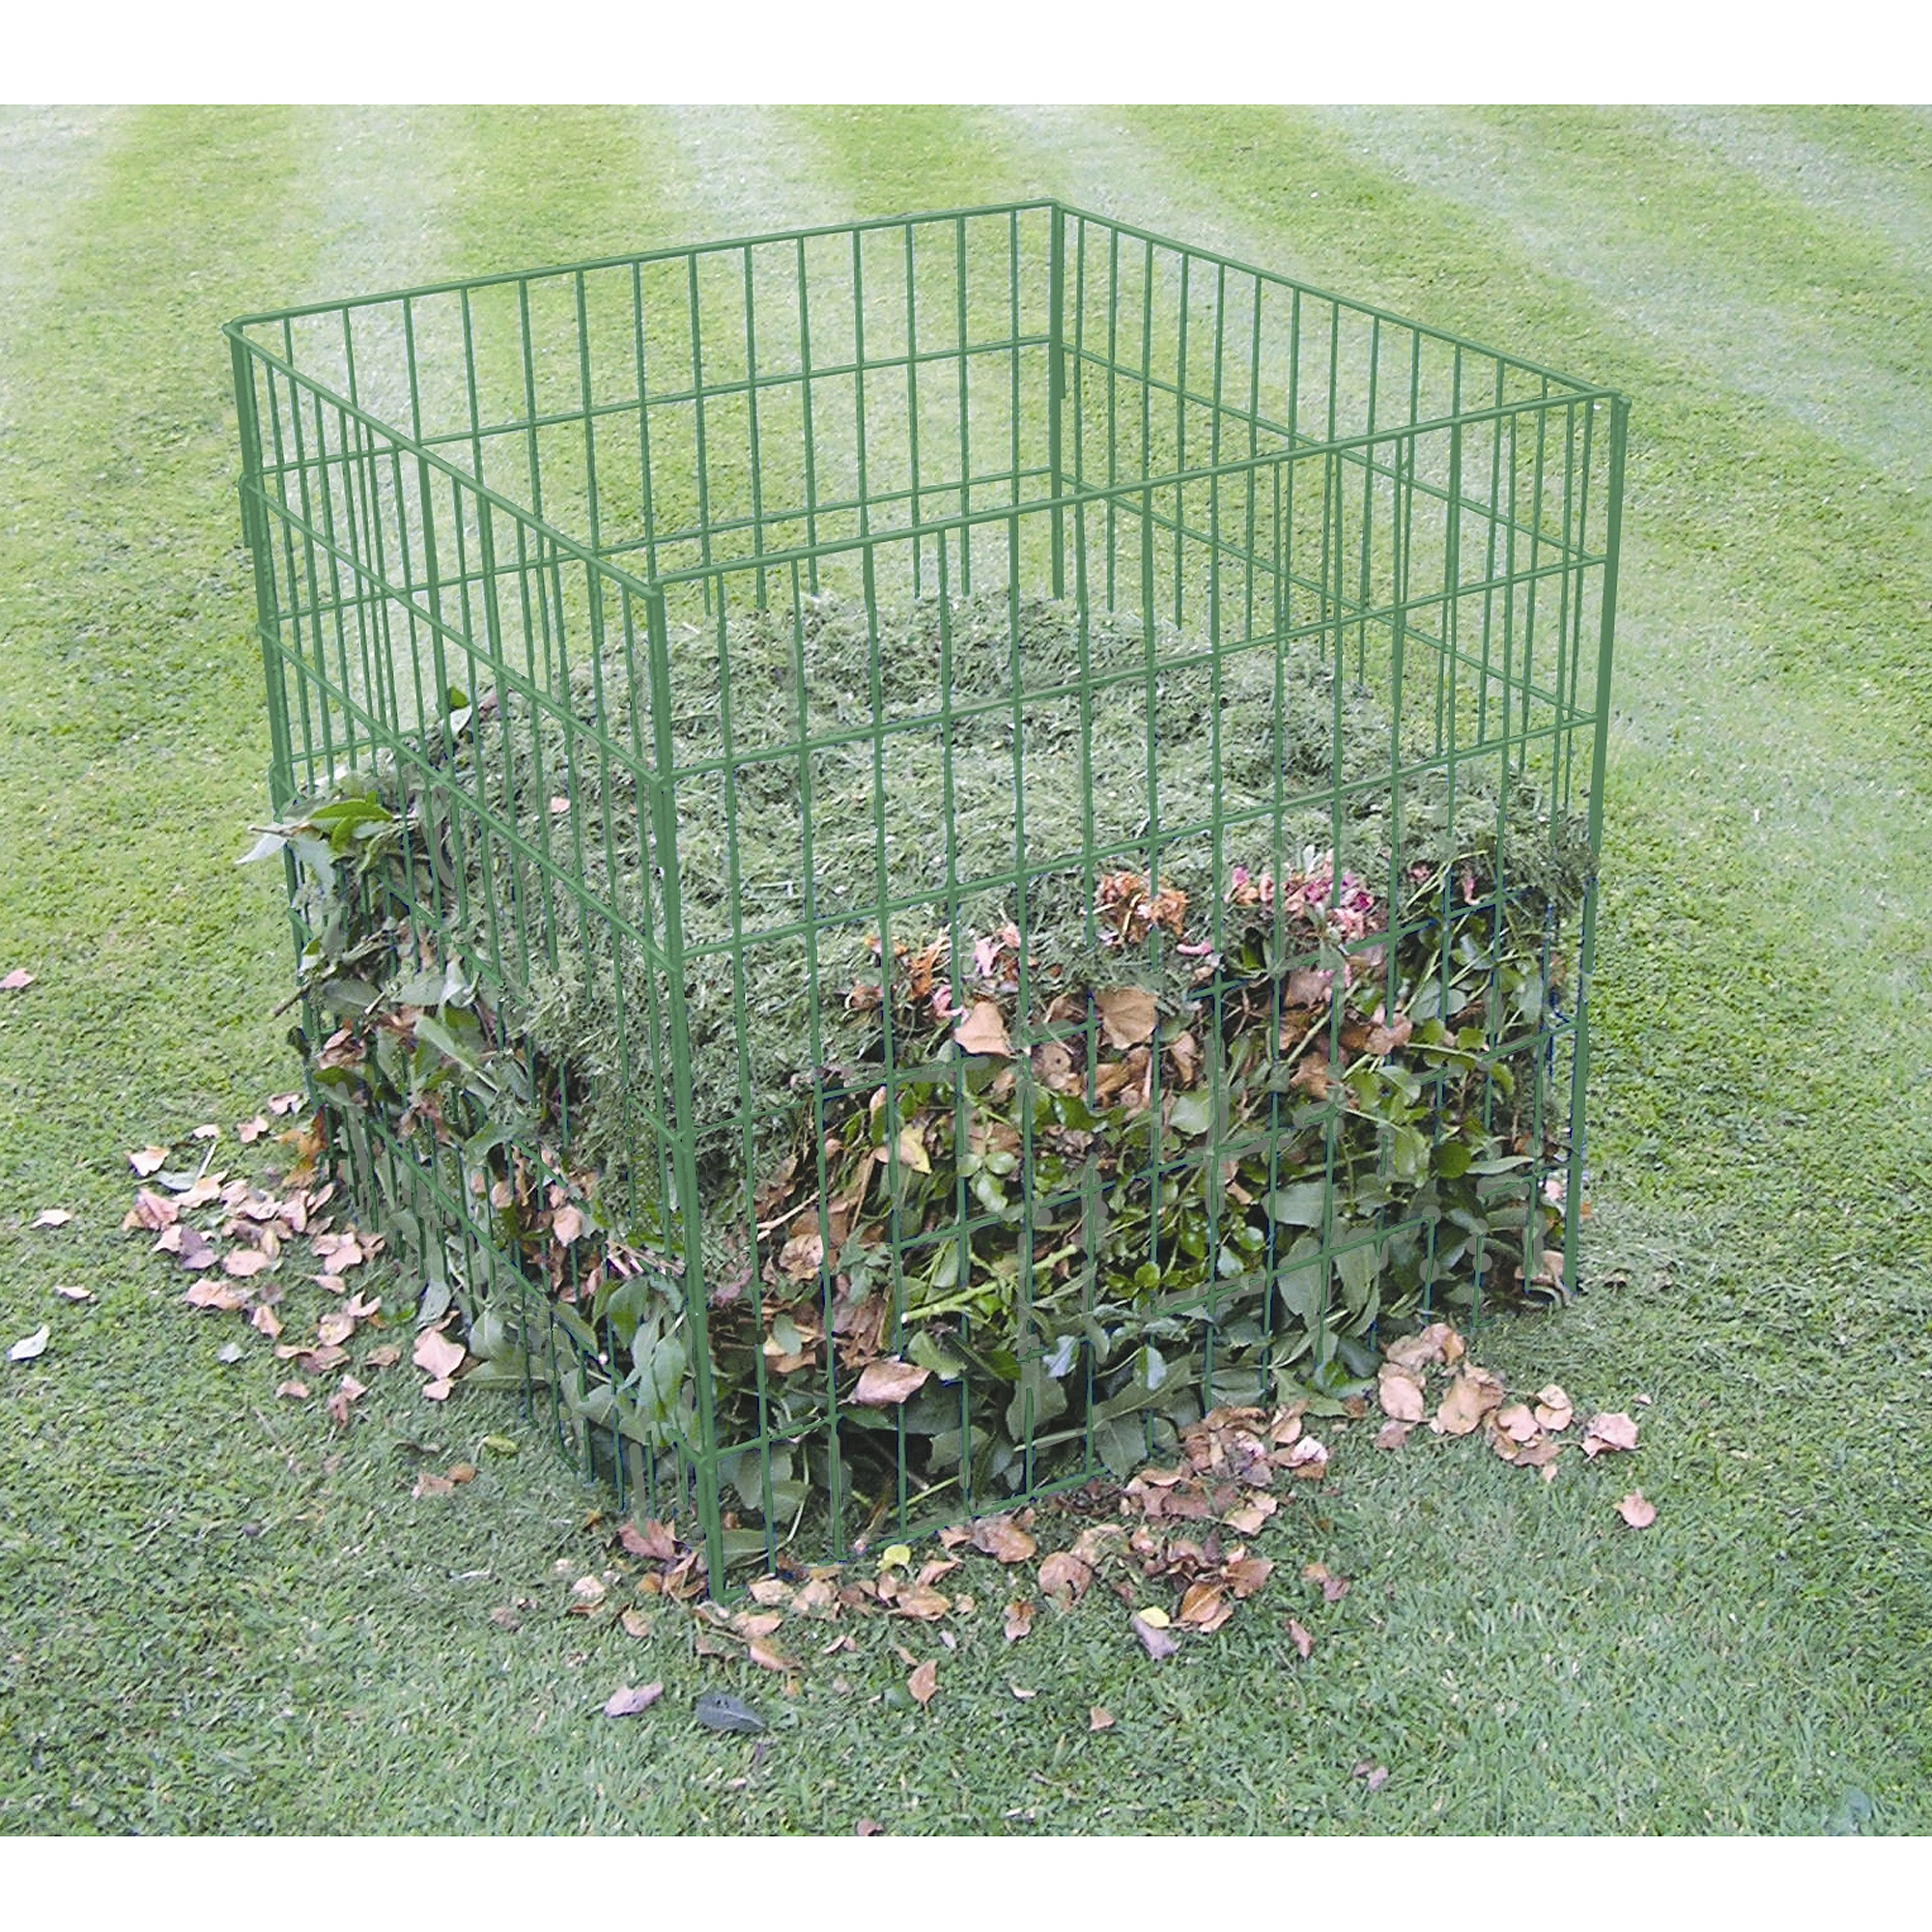 Bosmere Wire Compost Bin K765 by Bosmere